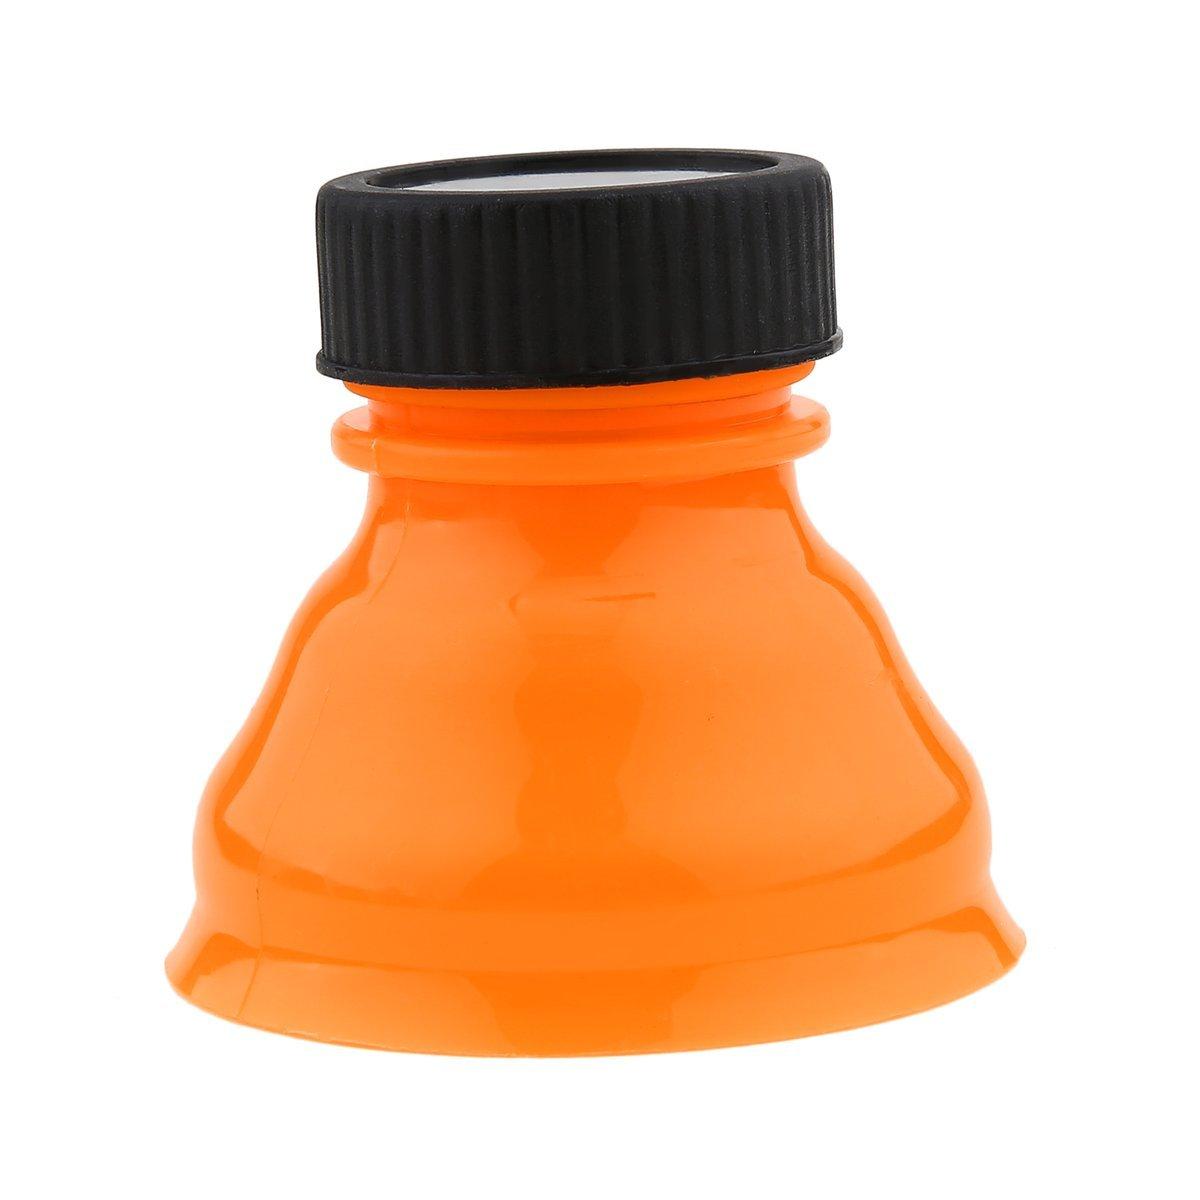 Seis PC//set port/átil puede convertir Soda Savers Botella de refresco Tapa de bebida Tapas Abridores Material de polipropileno Reutilizable-Alan Graham ScottVF Alan Graham ScottVF